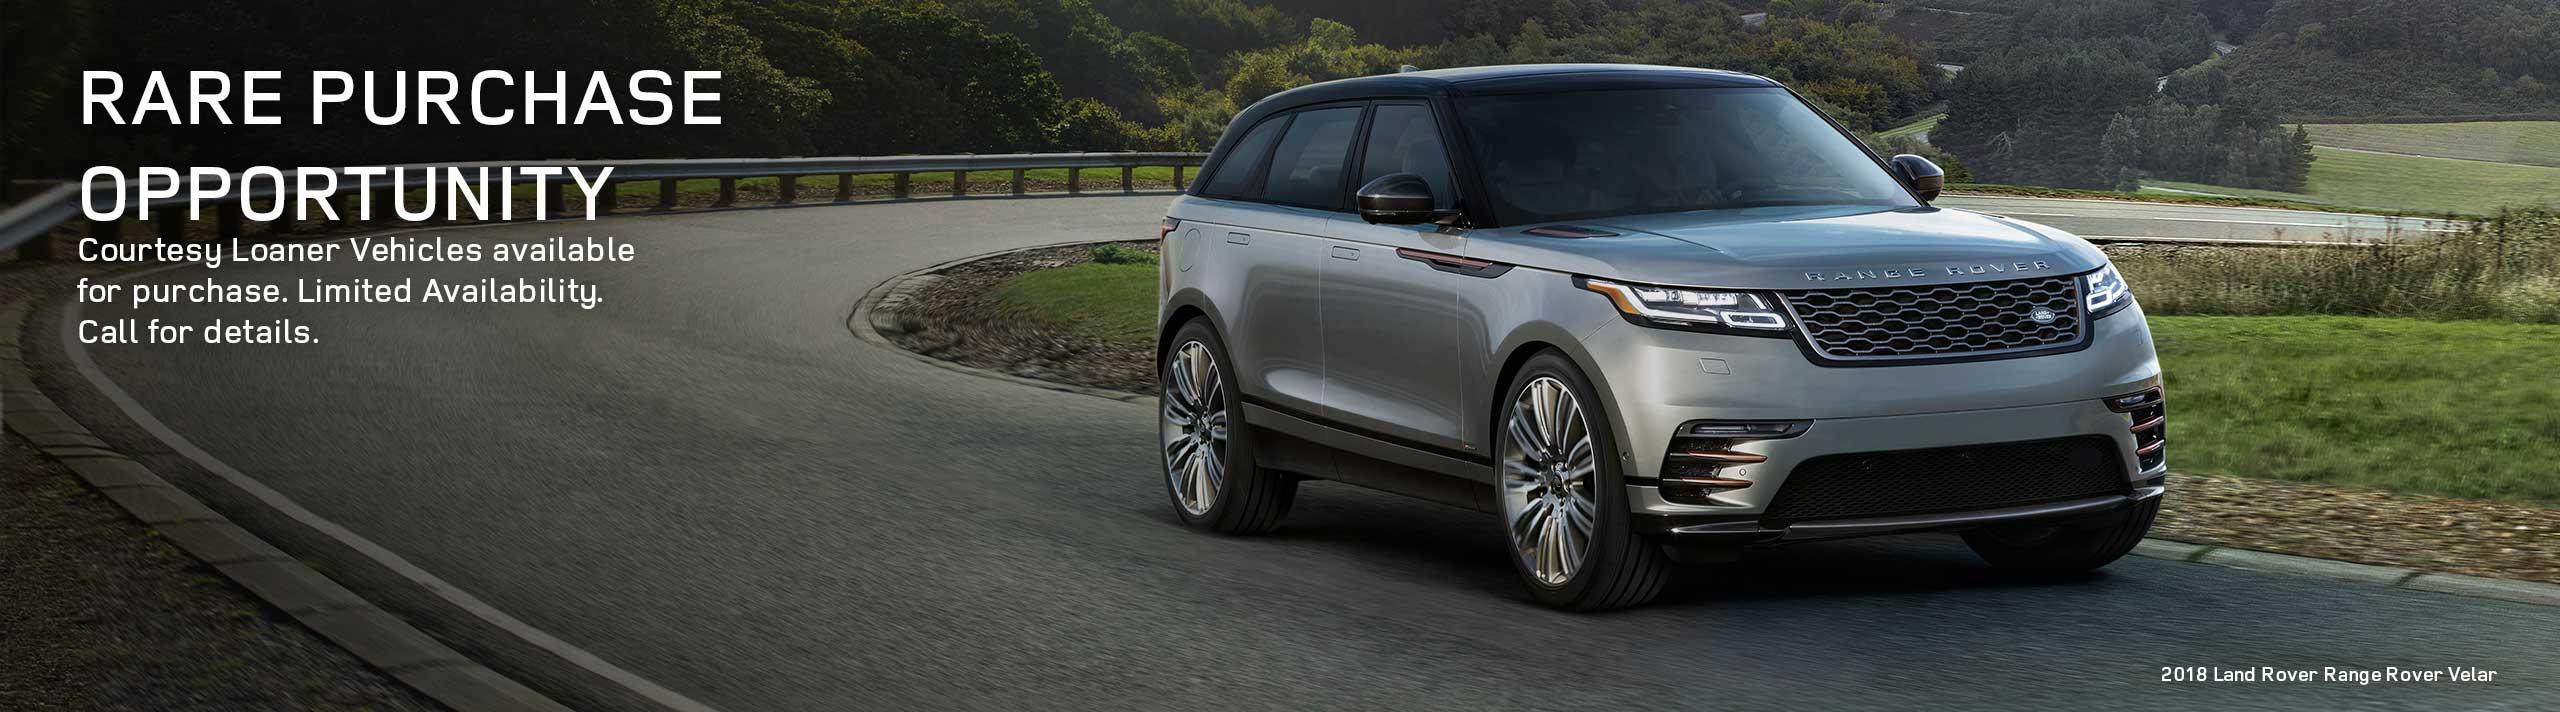 land-rover-courtesy-loaner-1280 - Cole European Jaguar Land Rover